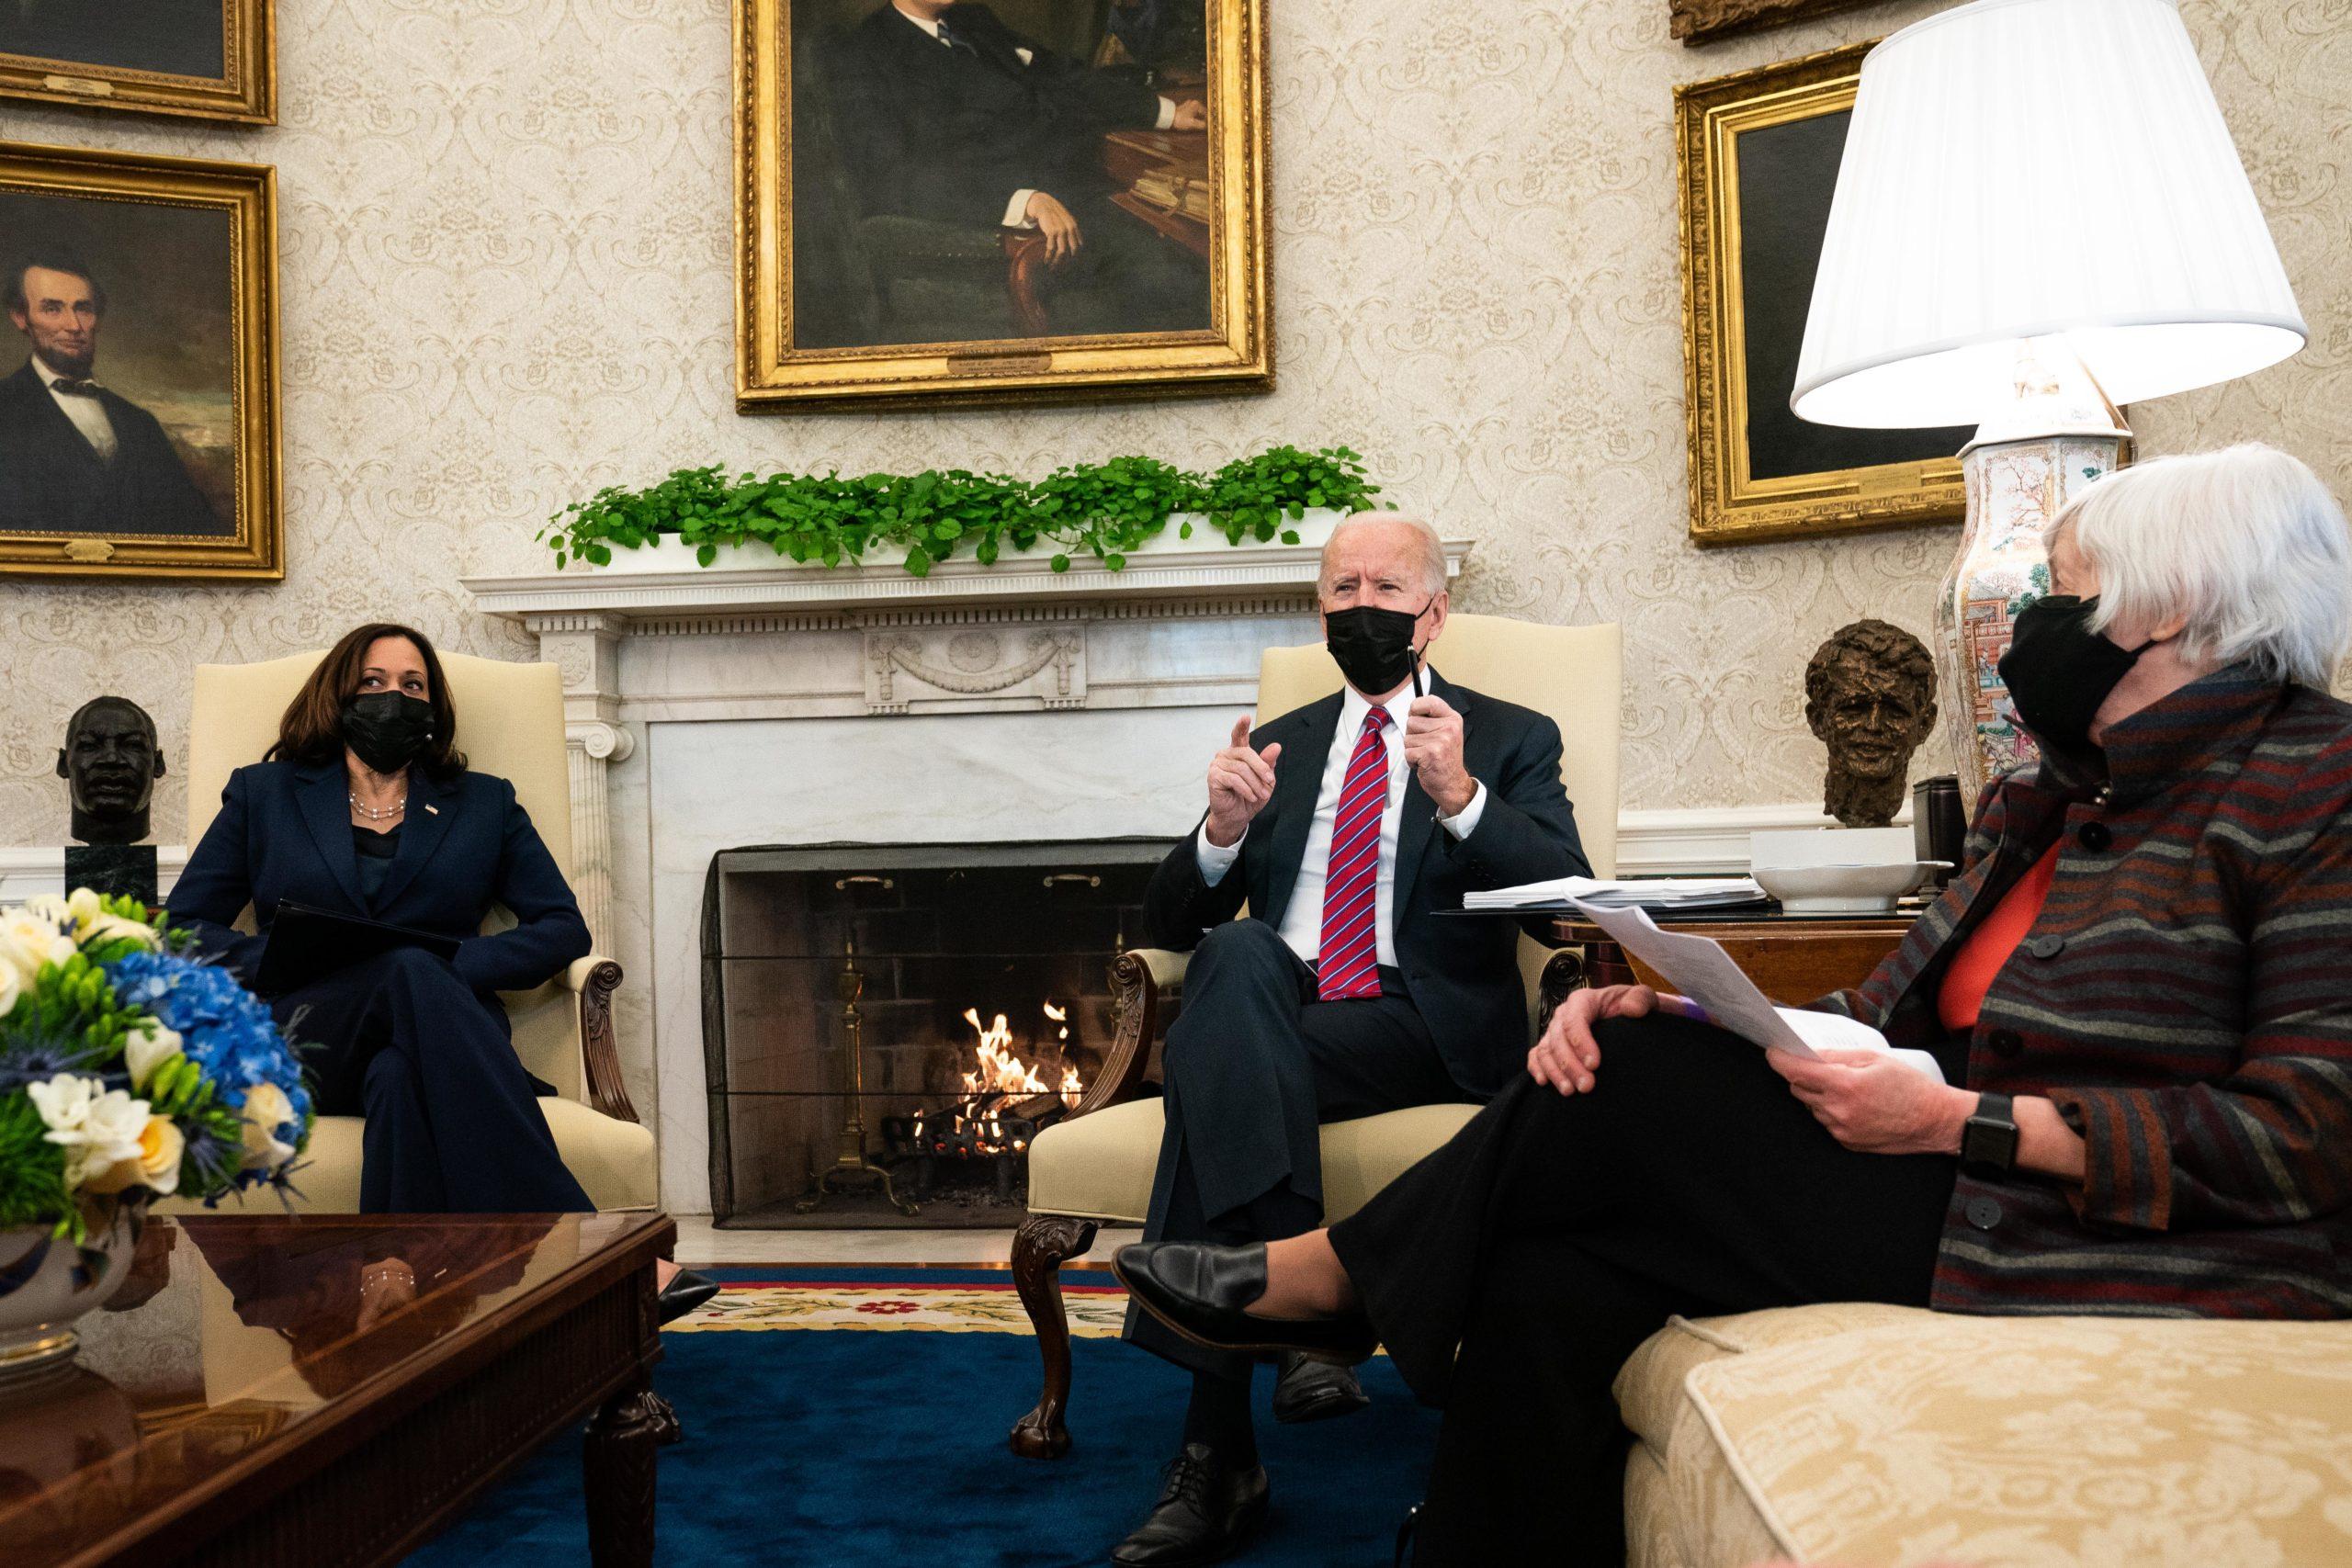 Vice President Kamala Harris and U.S. President Joe Biden meet with Treasury Secretary Janet Yellen in the Oval Office of the White House on January 29, 2021. (Anna Moneymaker-Pool/Getty Images)